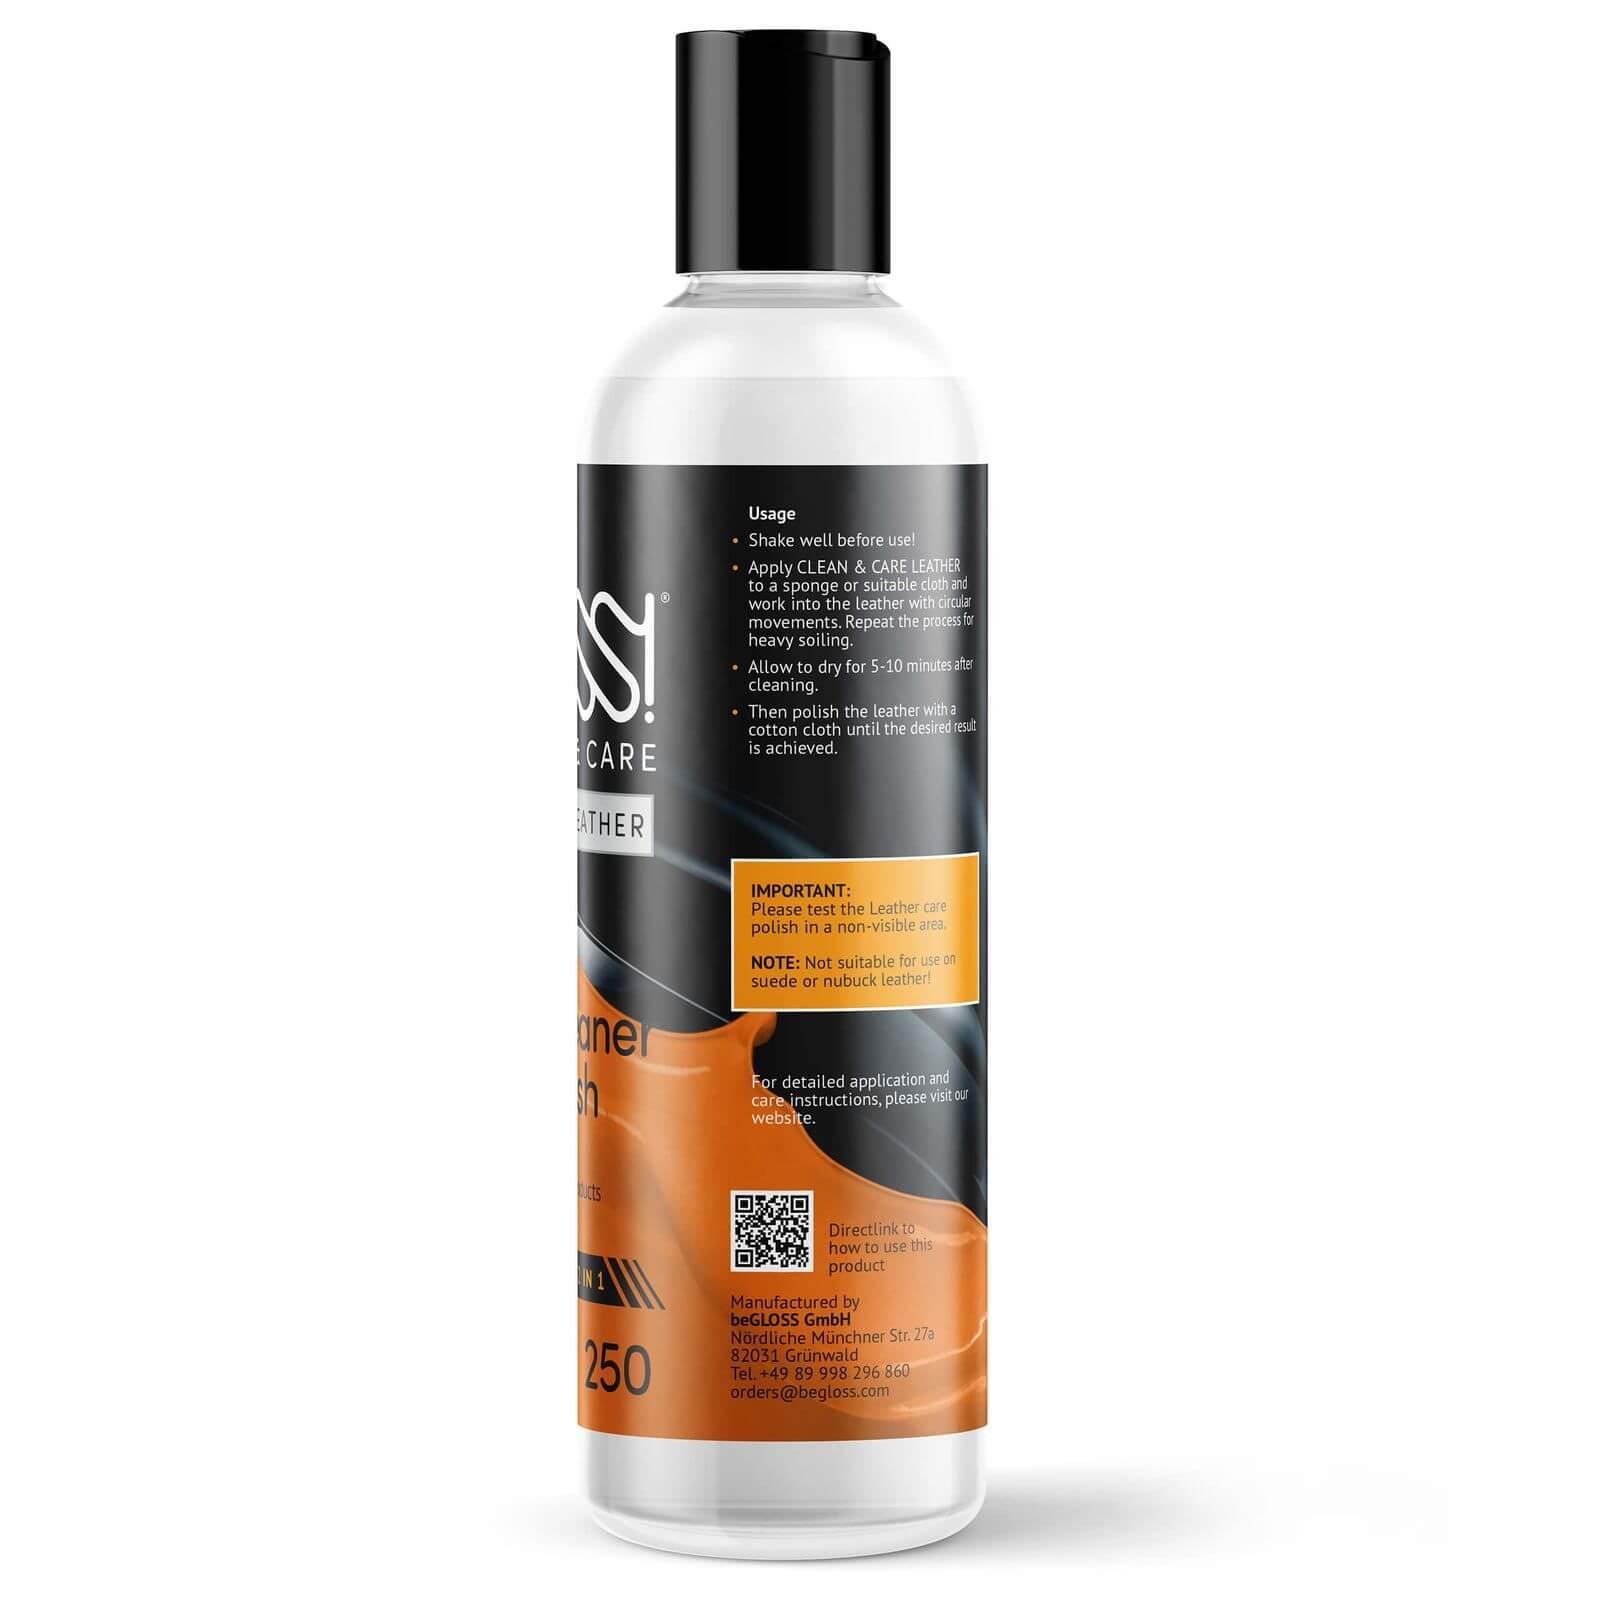 beGLOSS CLEAN & CARE NAHKA 250 ml